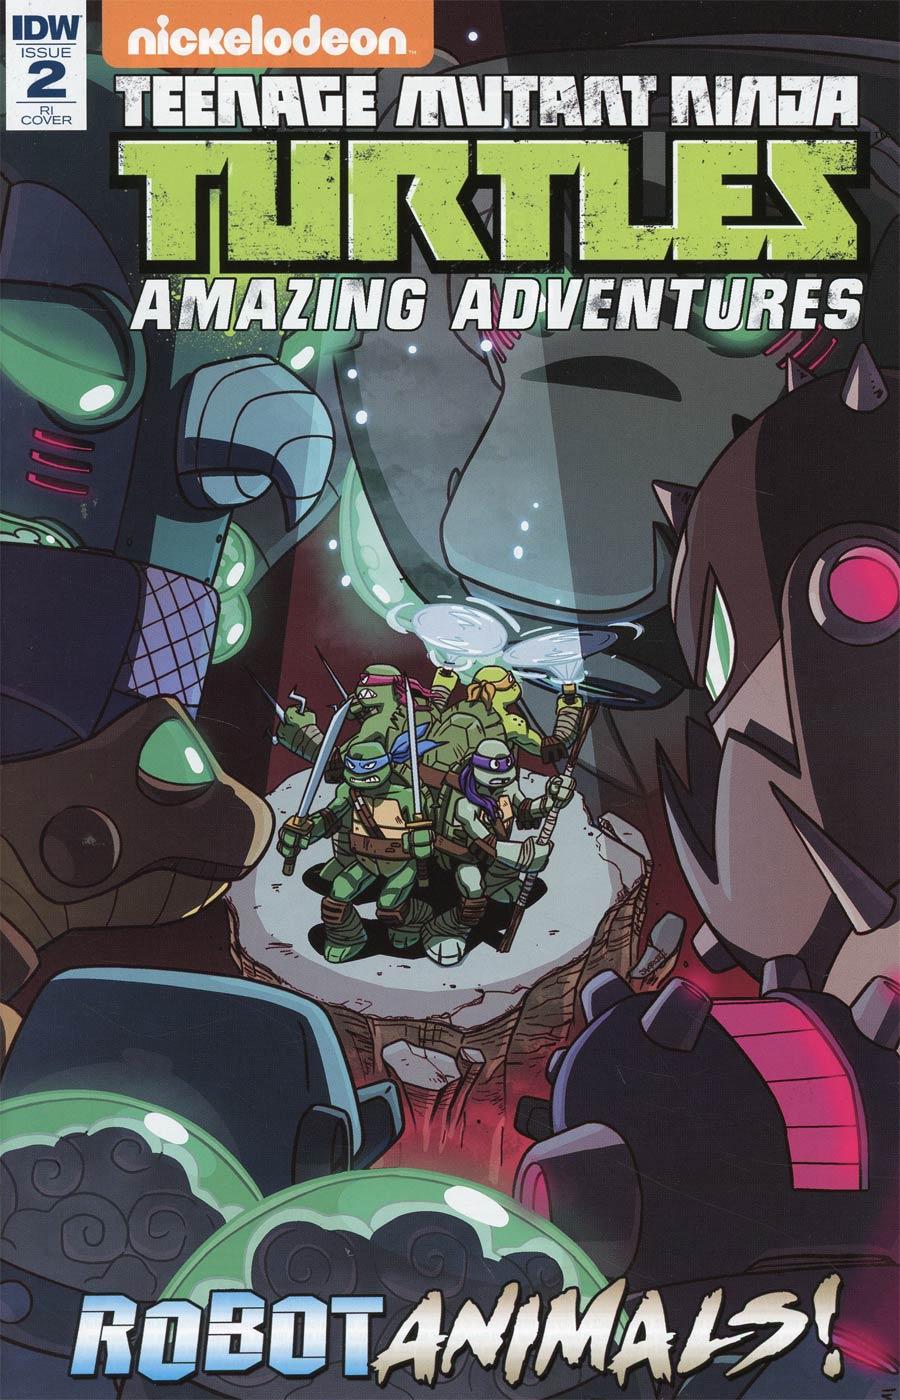 Teenage Mutant Ninja Turtles Amazing Adventures Robotanimals #2 Cover C Incentive Ryan Jampole Variant Cover